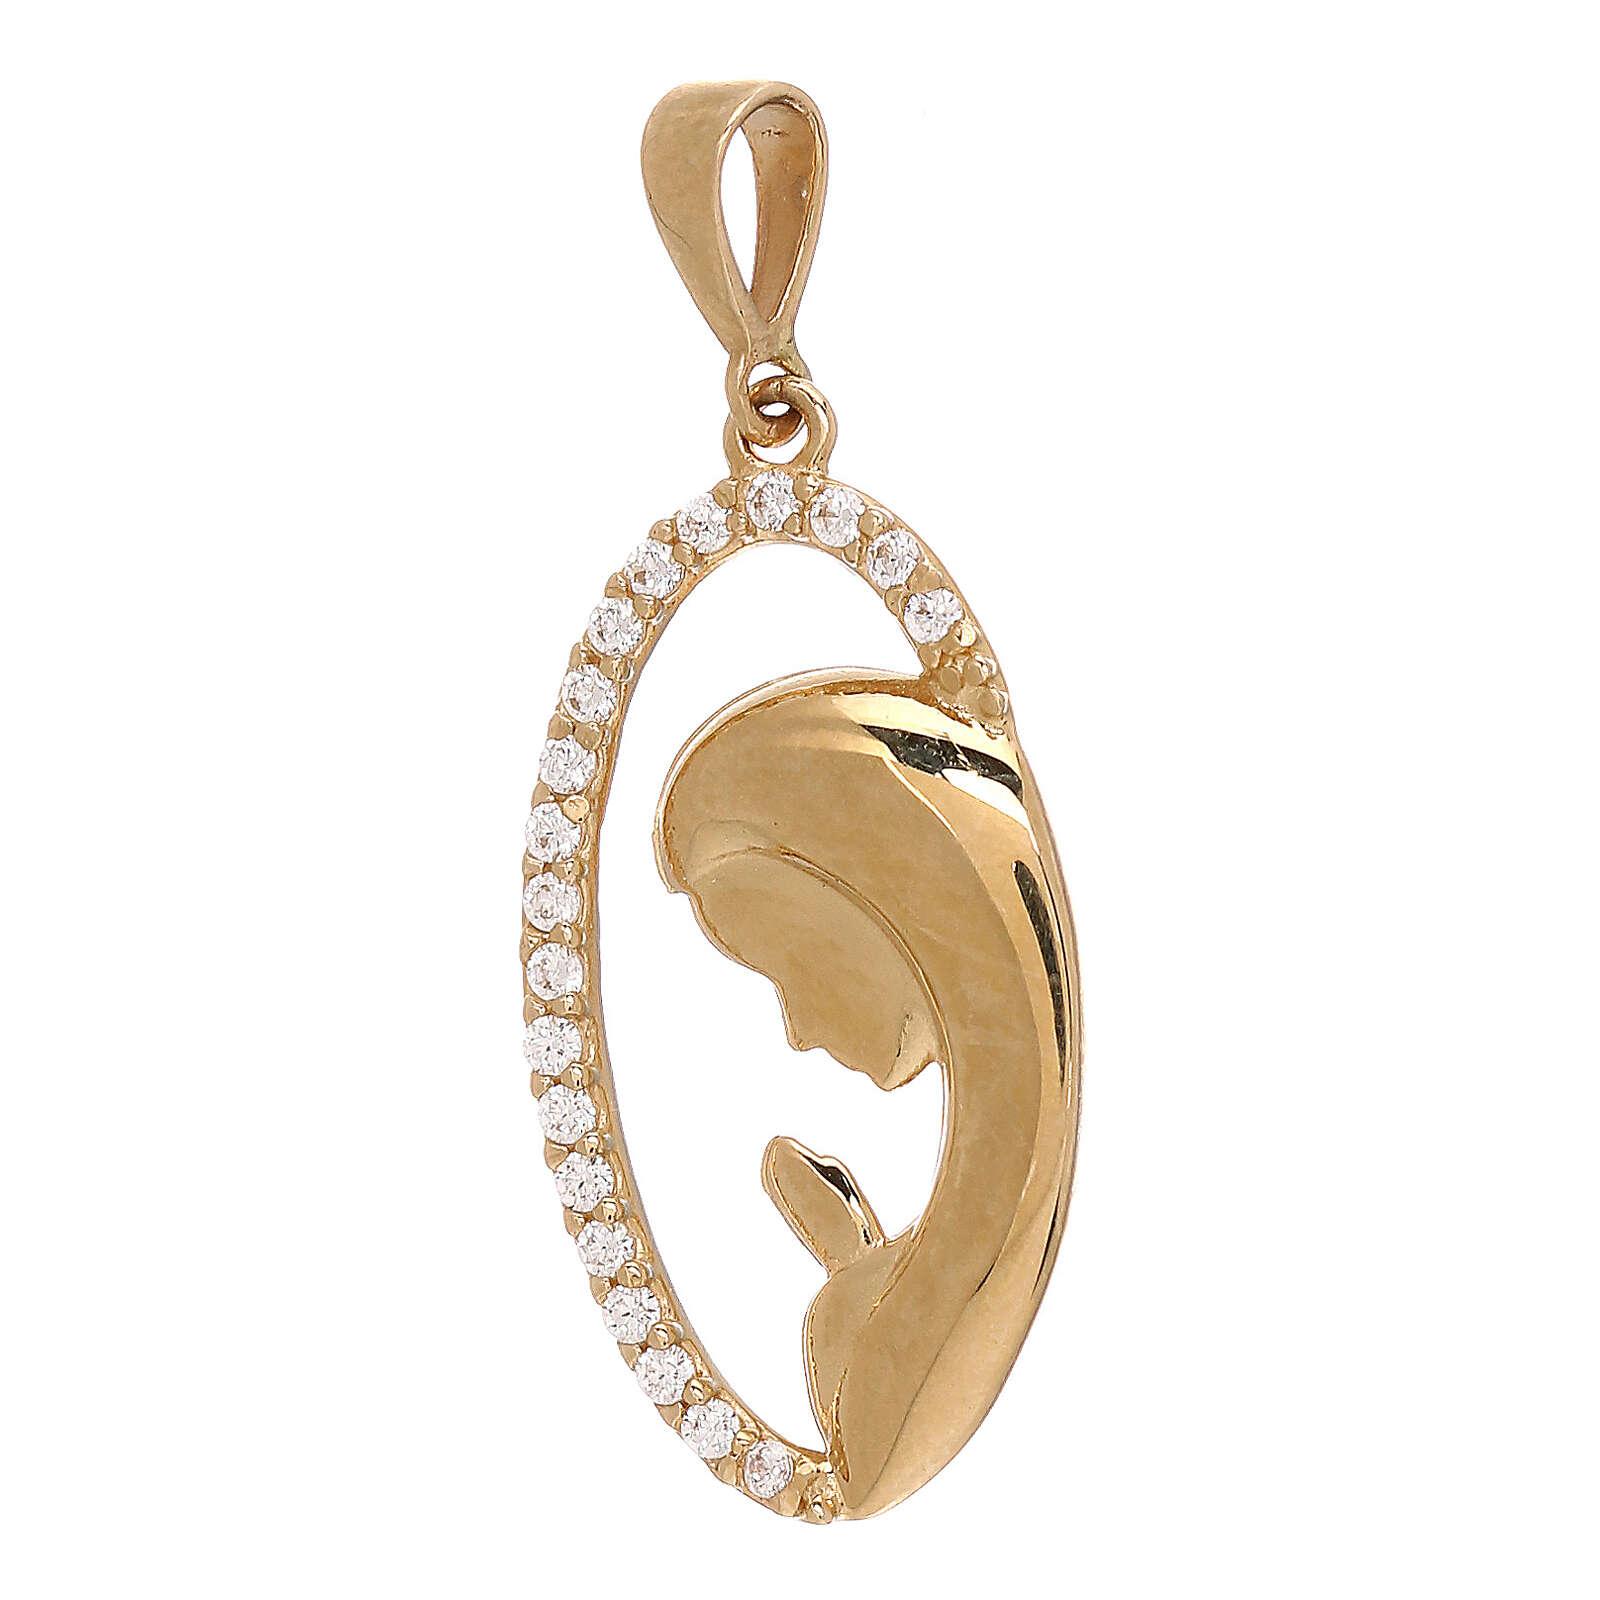 Pendente ovale Madonna oro giallo Swarovski bianchi 1,65 gr 4